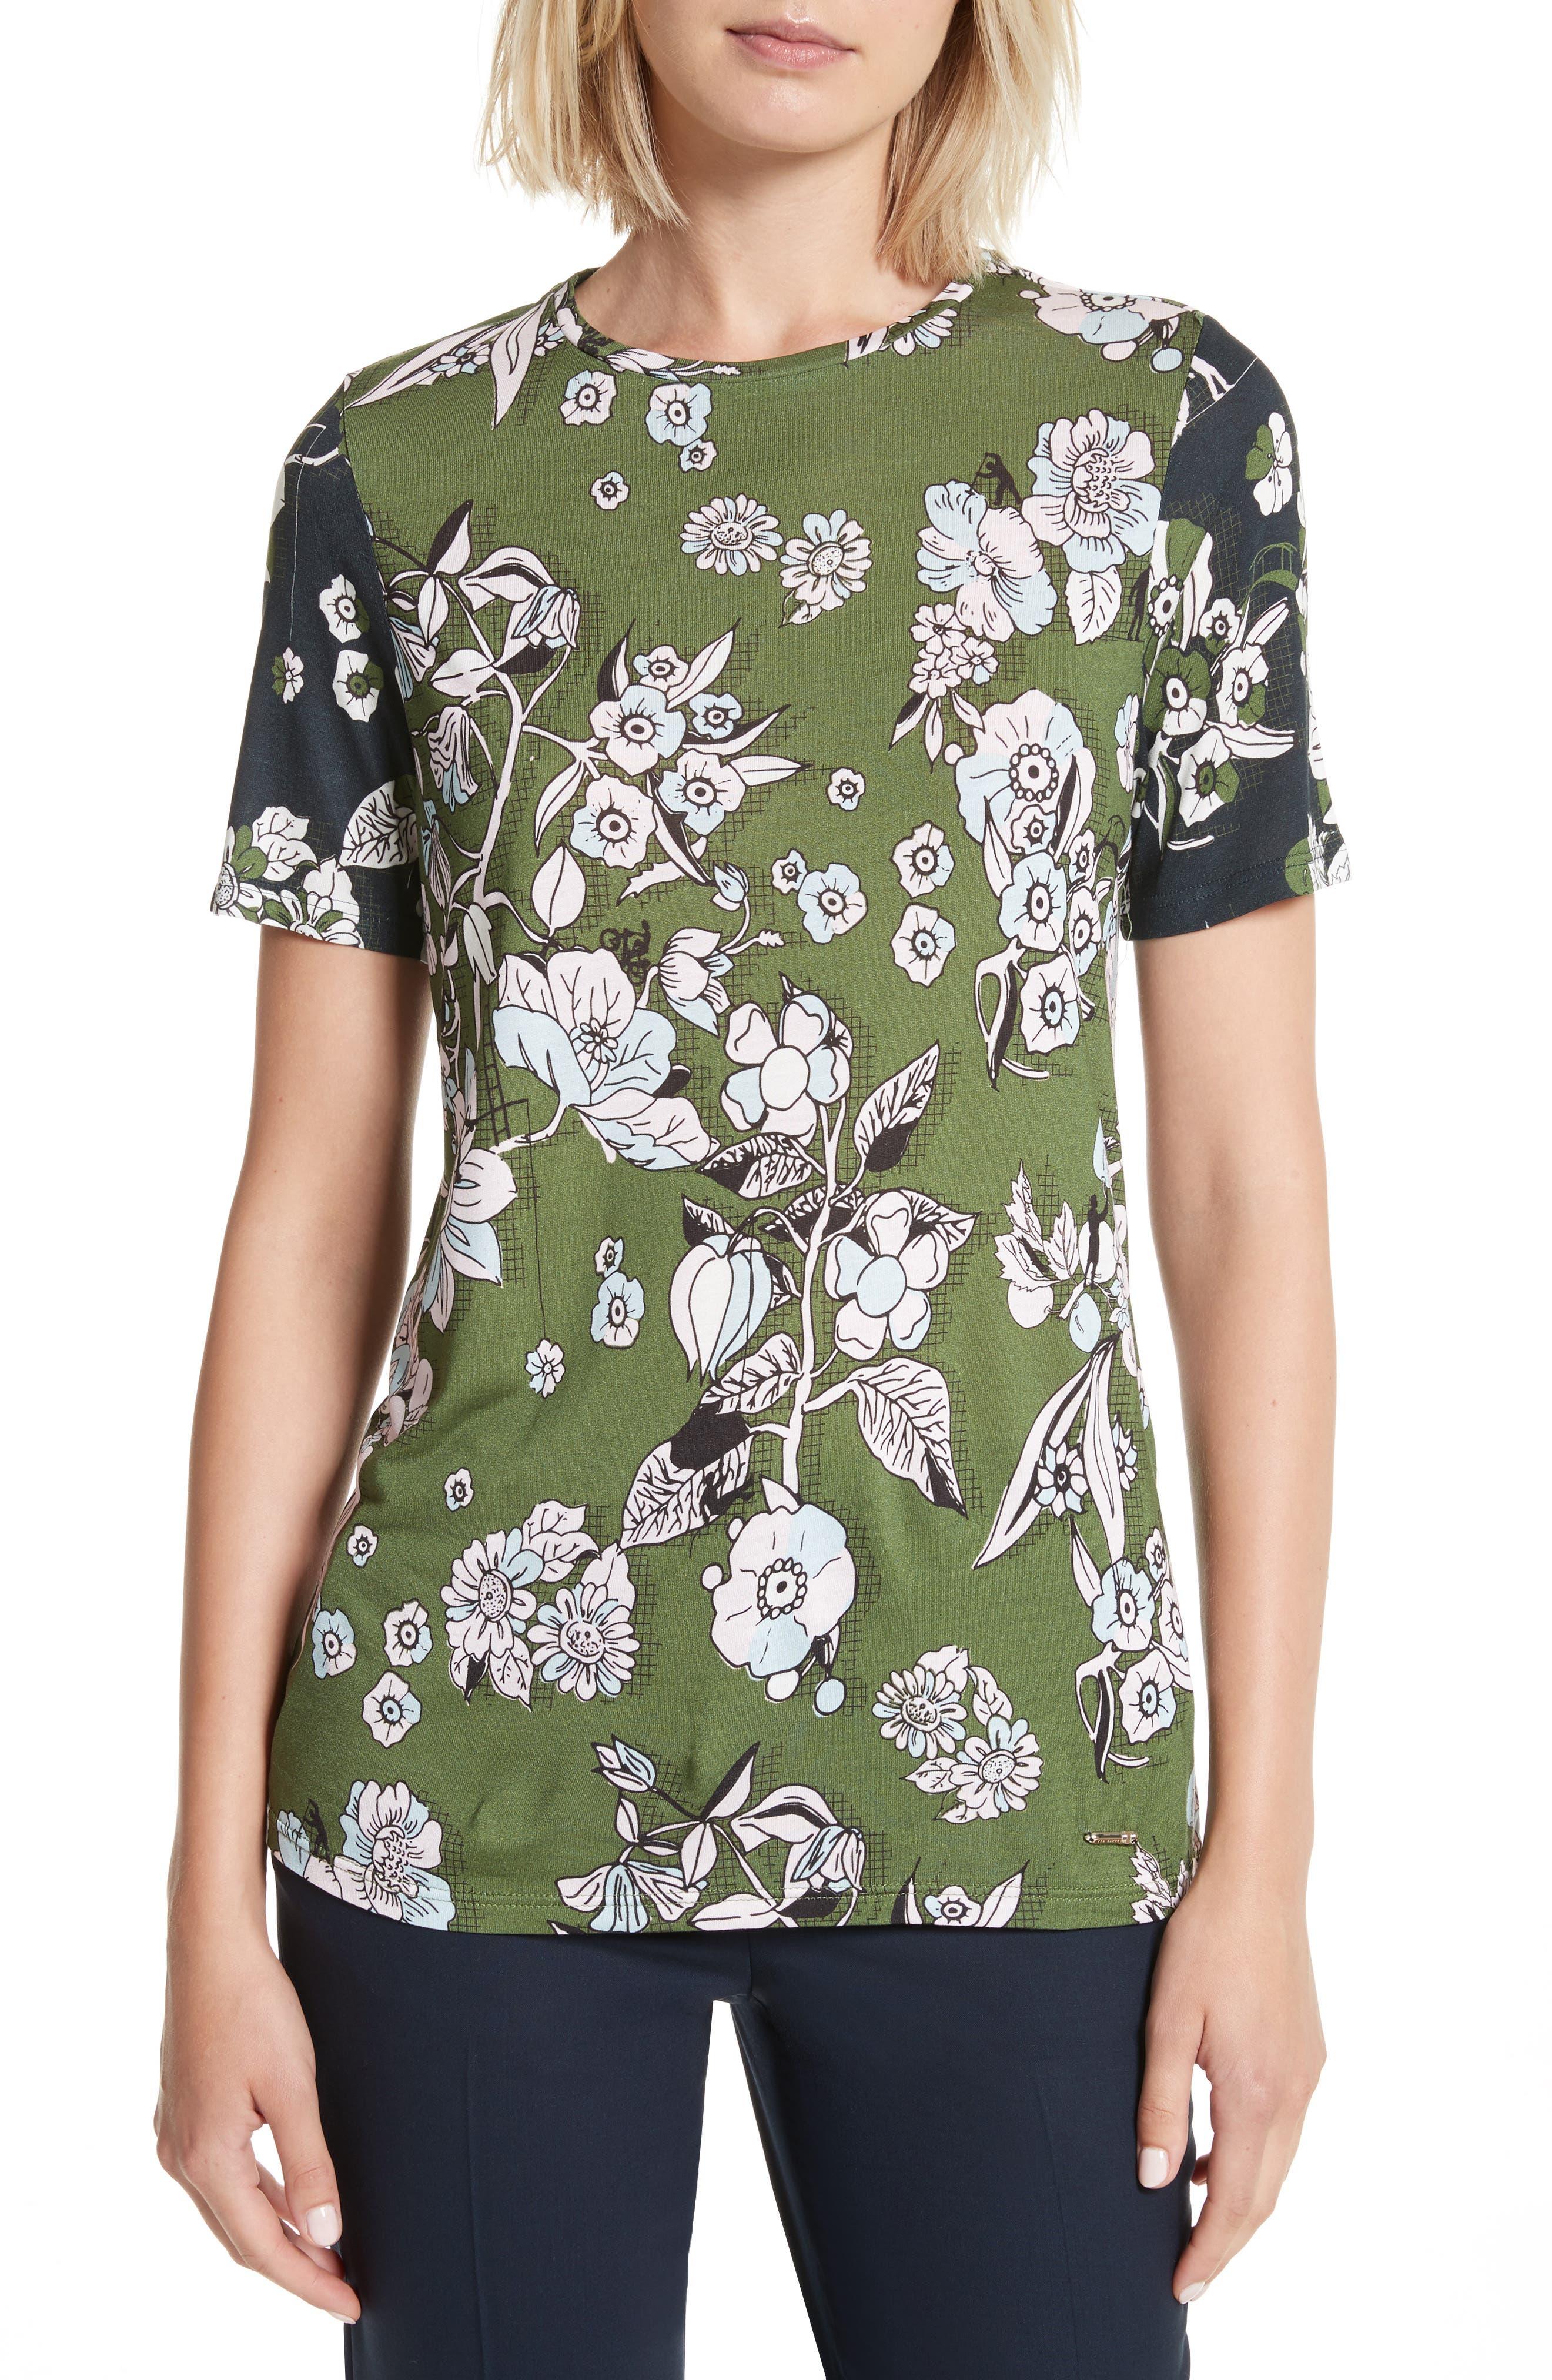 Adren Floral Print Tee,                         Main,                         color, 311